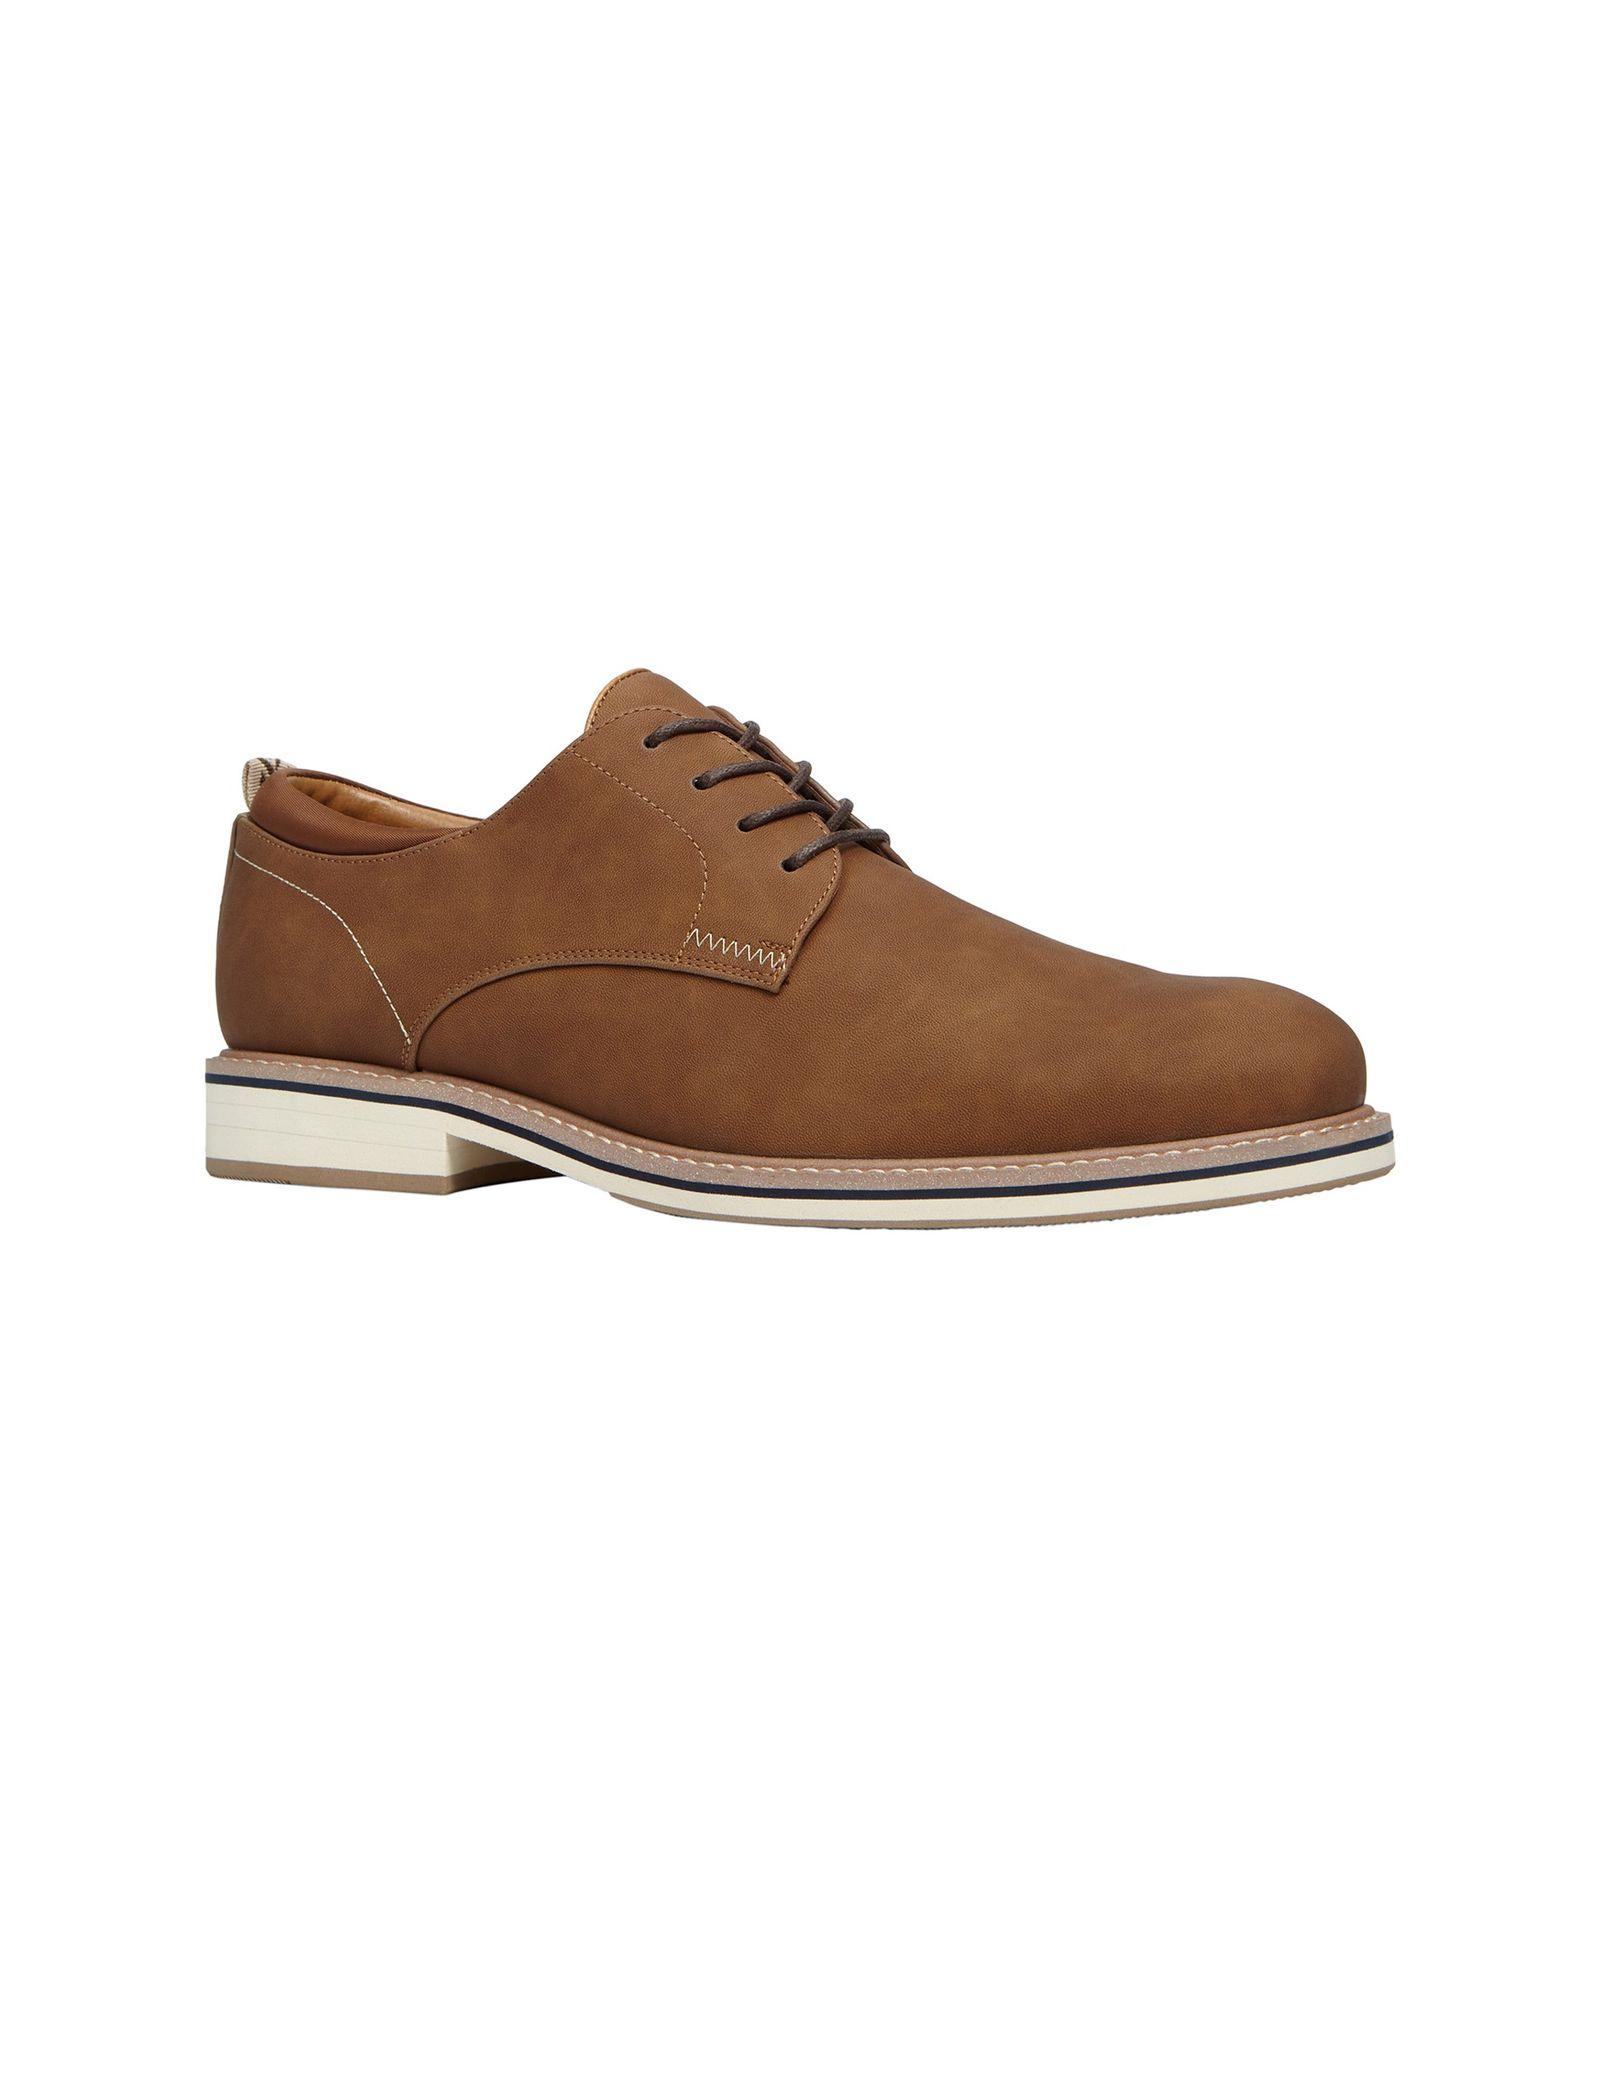 کفش اداری مردانه - کال ایت اسپرینگ - قهوه اي - 1